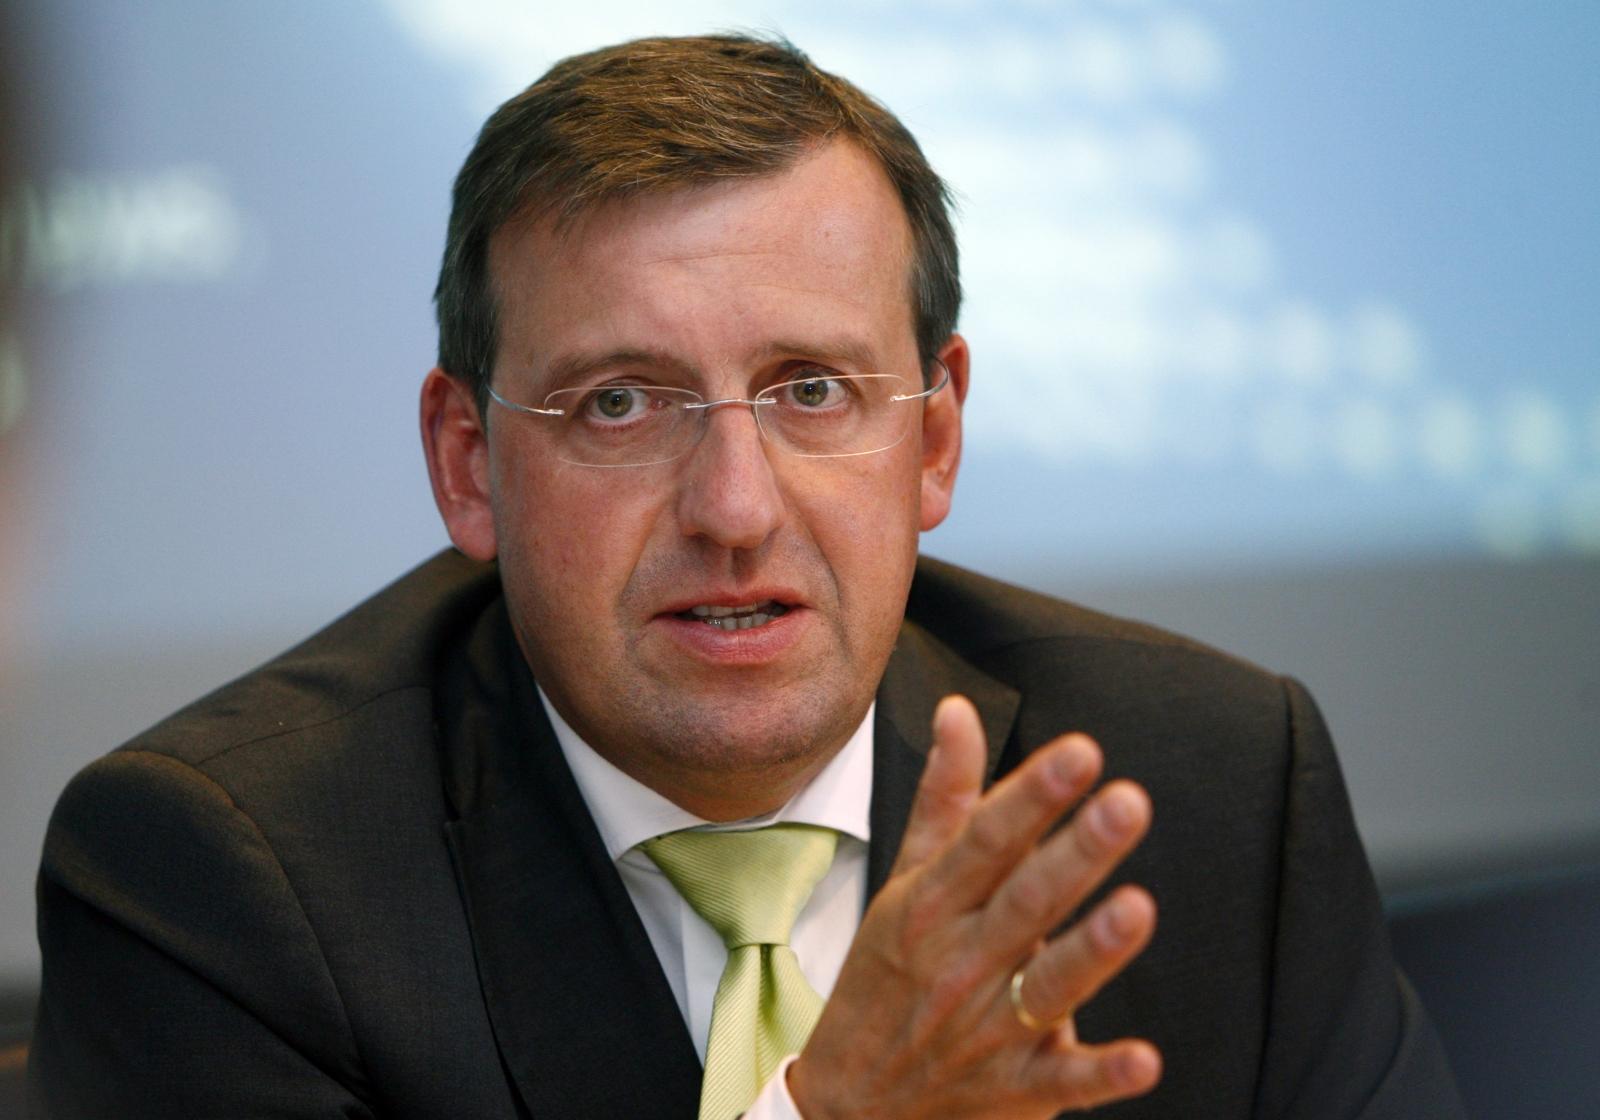 Stefan Wolf, CEO of ElringKlinger AG